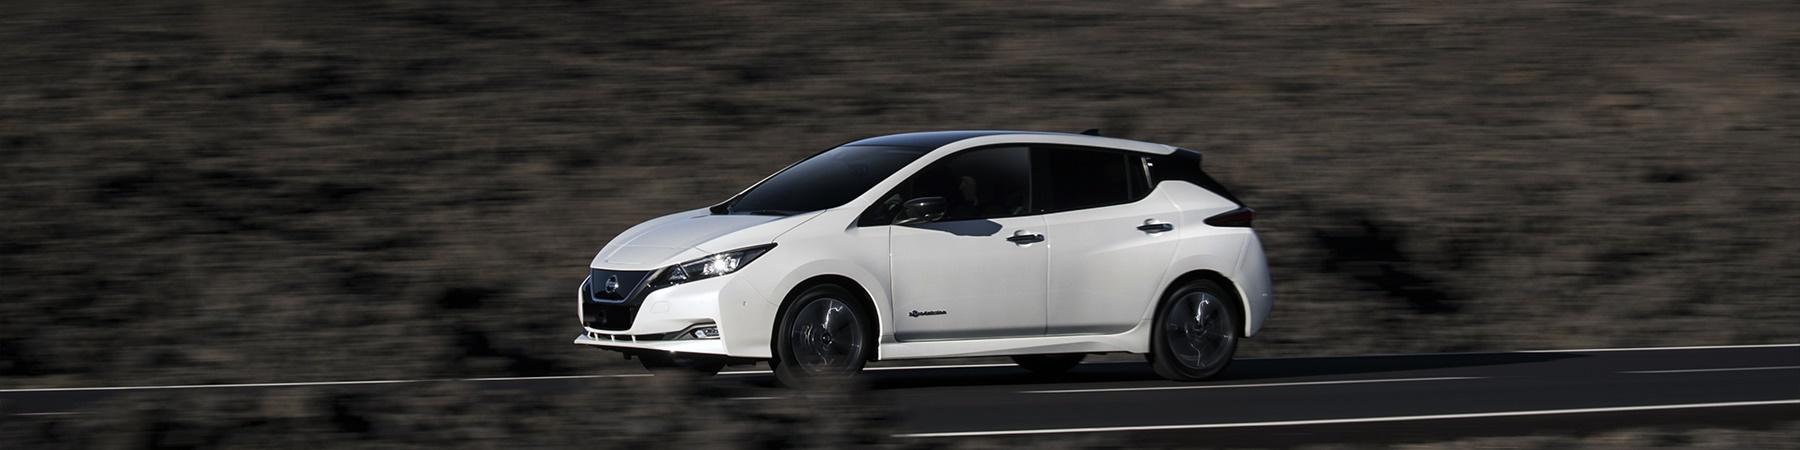 Nissan Leaf 40kWh 230 km actieradius